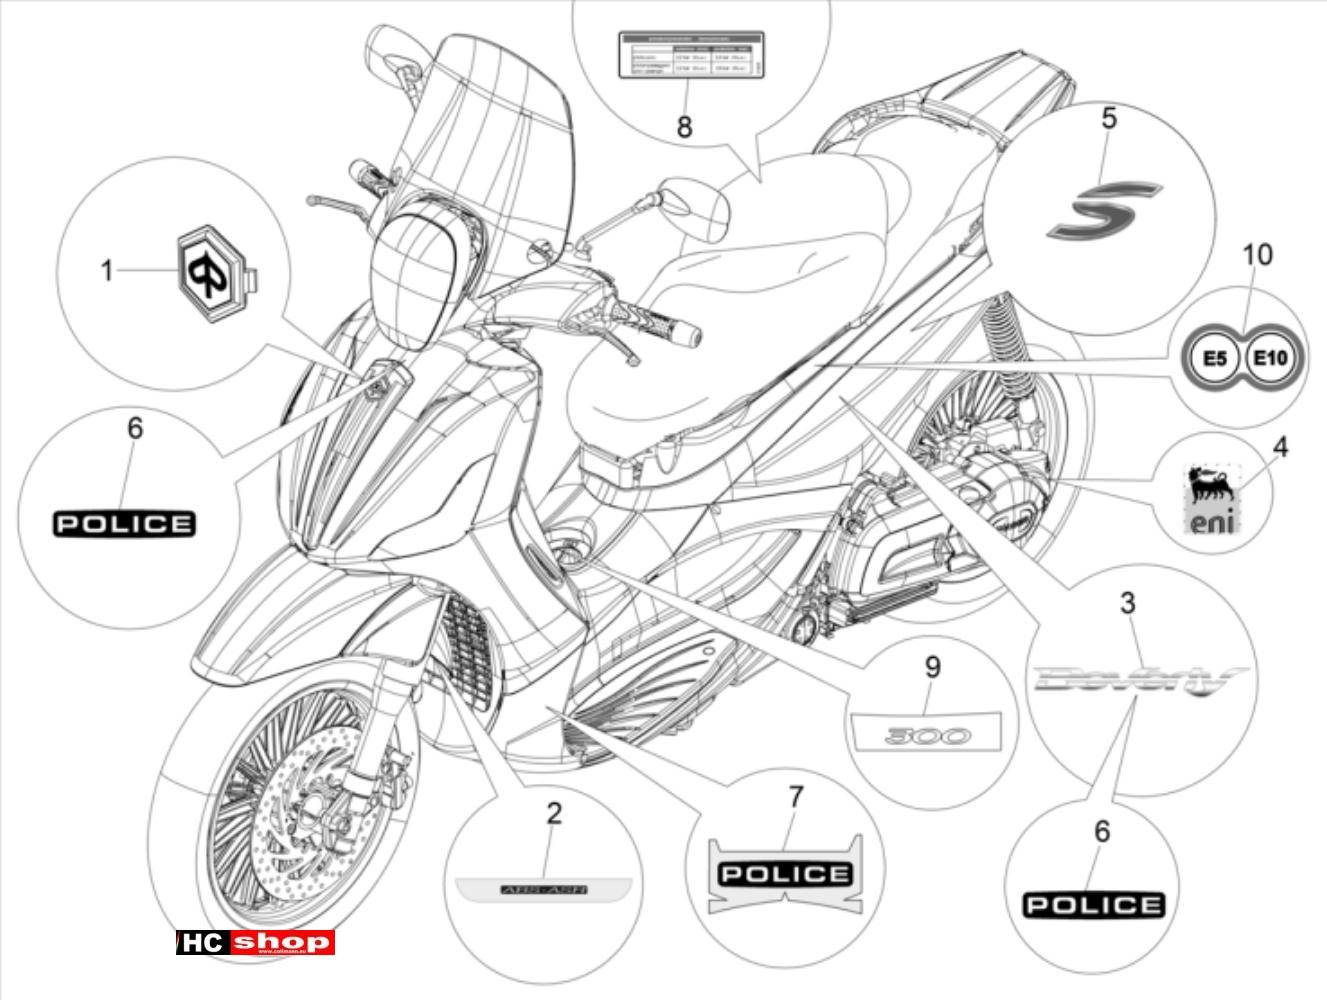 Piaggio Beverly 300 ABS Fahrgestell Plaketten